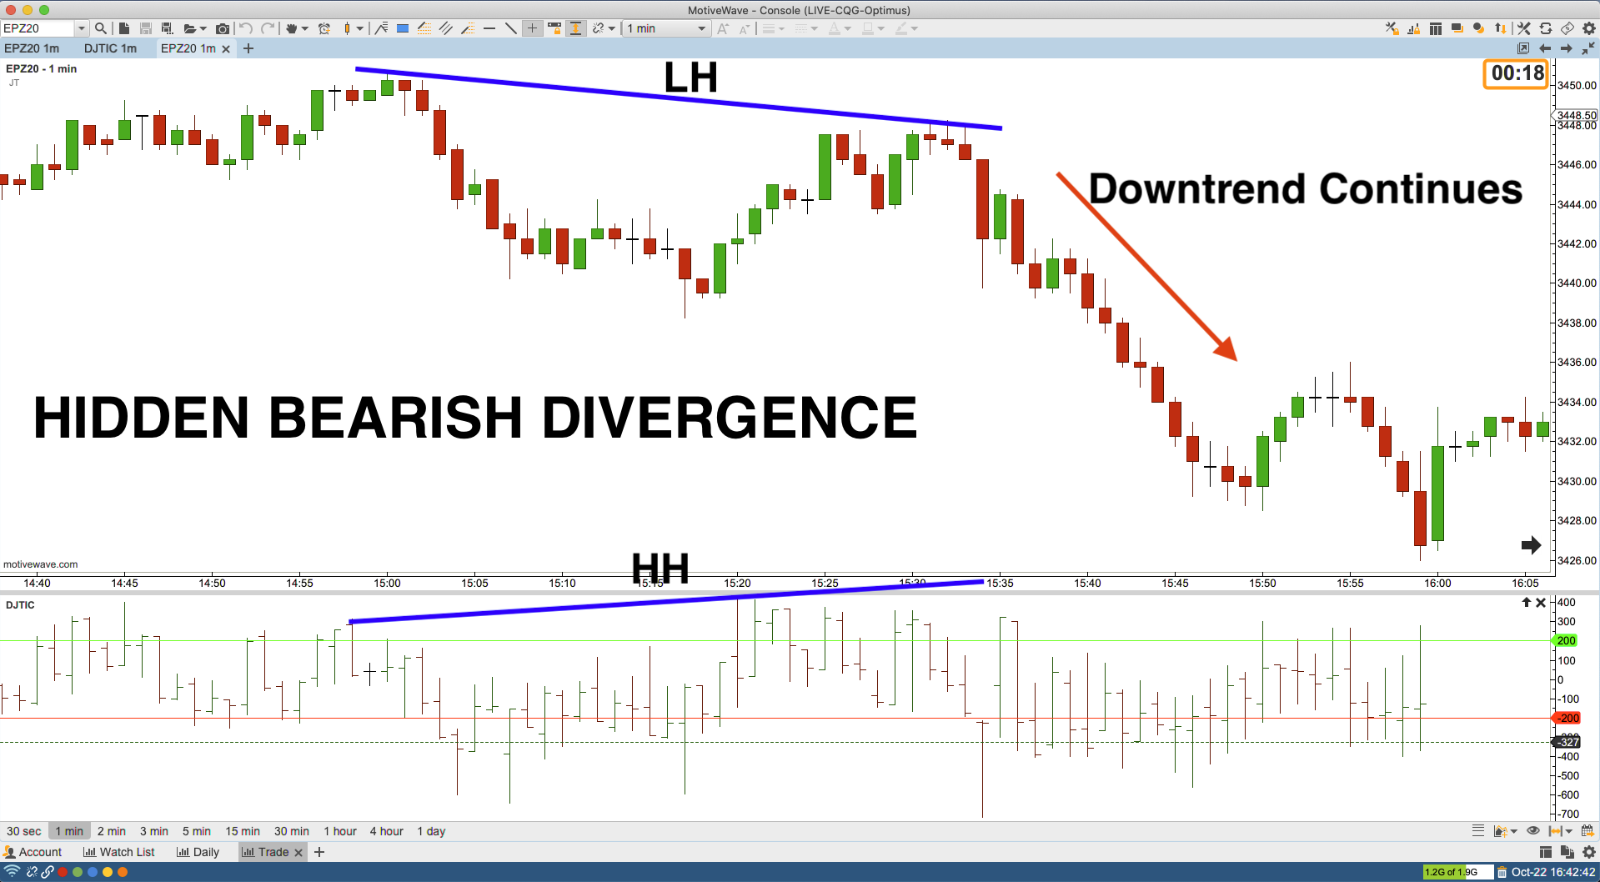 NYSE Tick Hidden Bearish Divergence